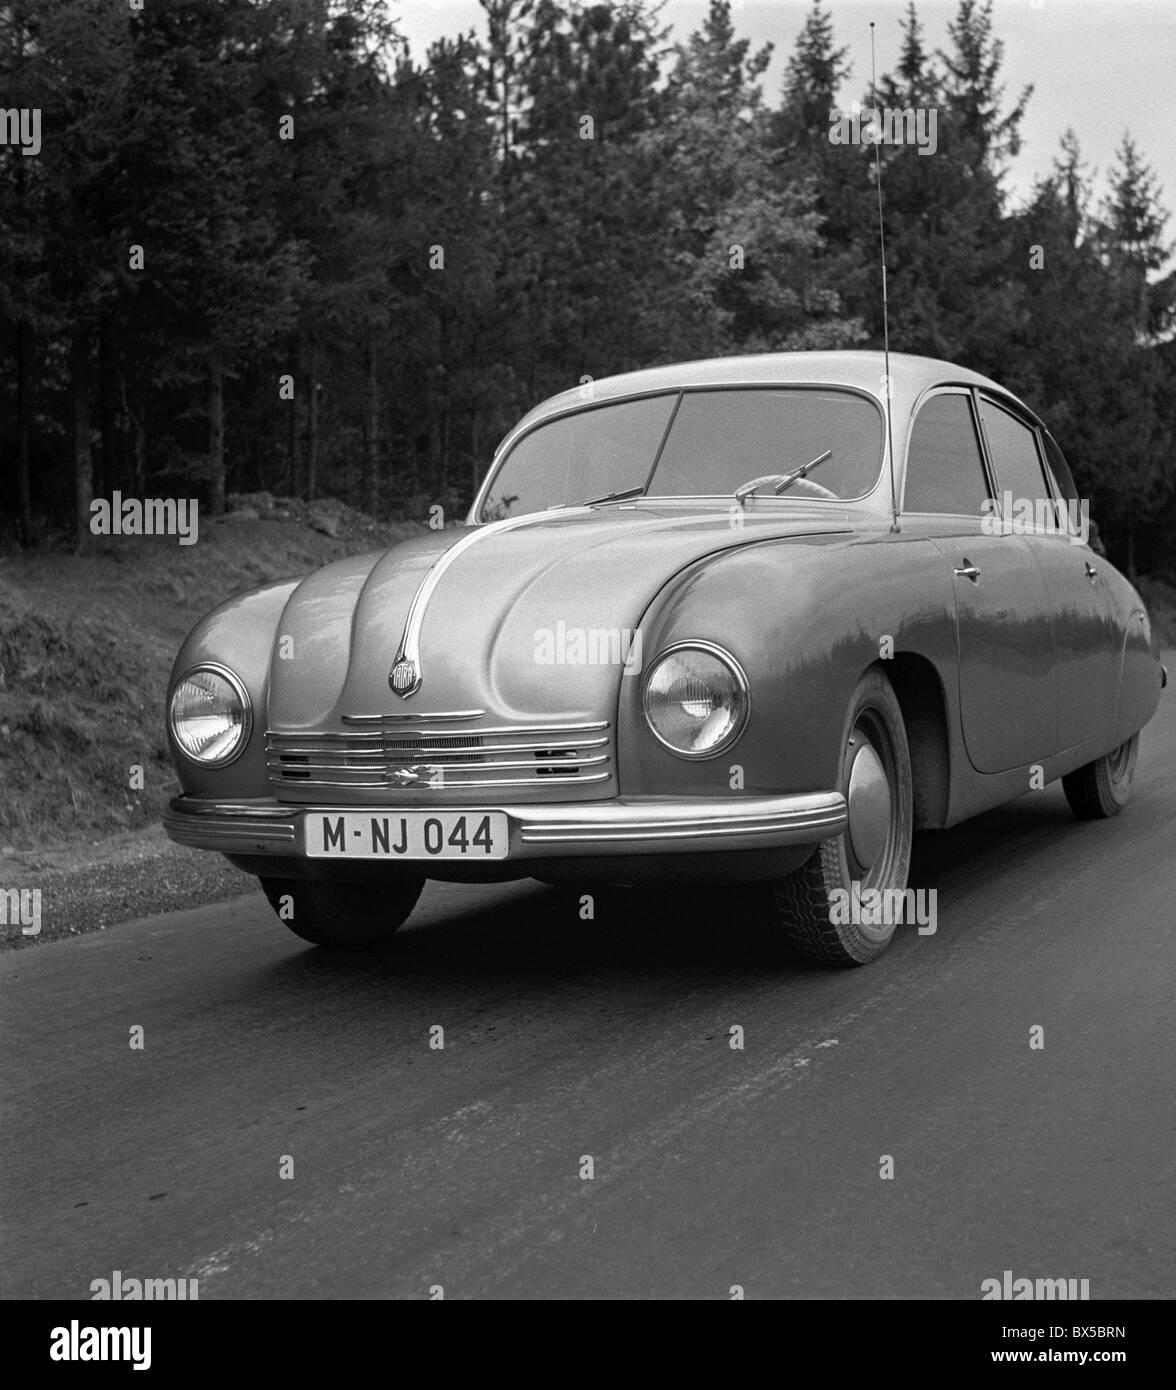 Czechoslovakia 1947 Tatraplan 600 produced by Tatra factory in Koprivnice featured Boxer type engine aerodynamic - Stock Image